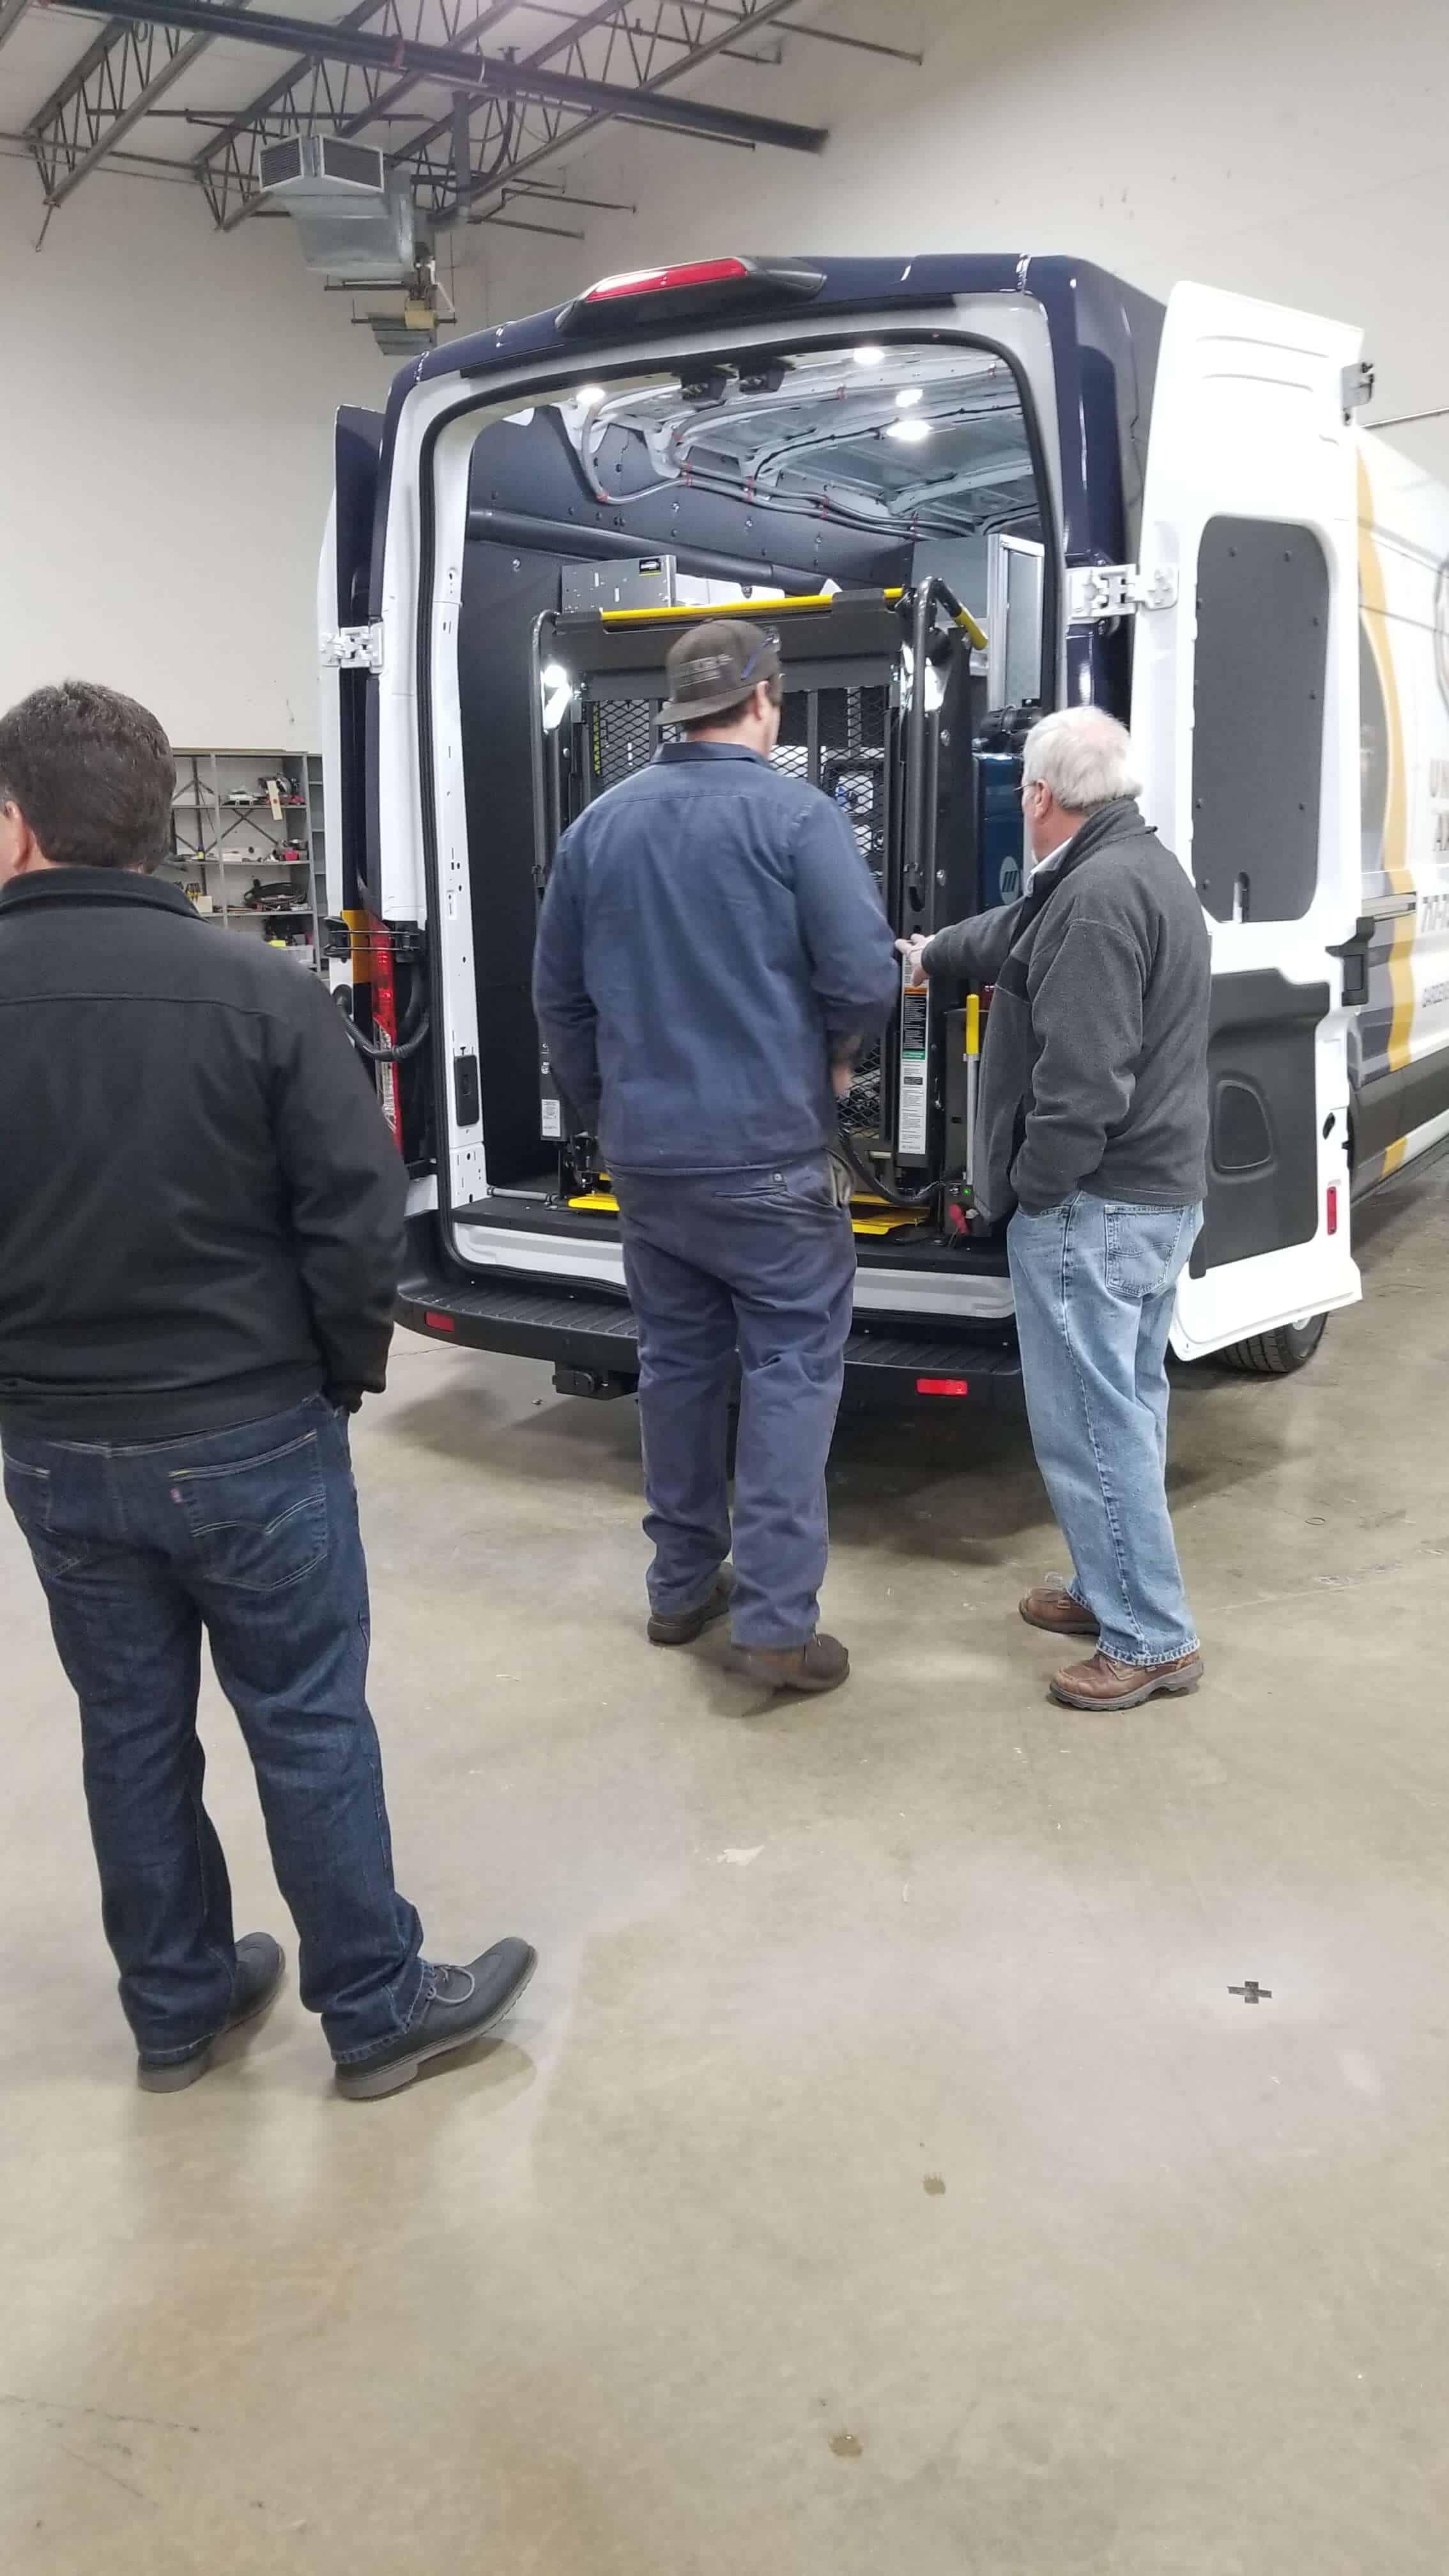 CVS Team Presenting the Van